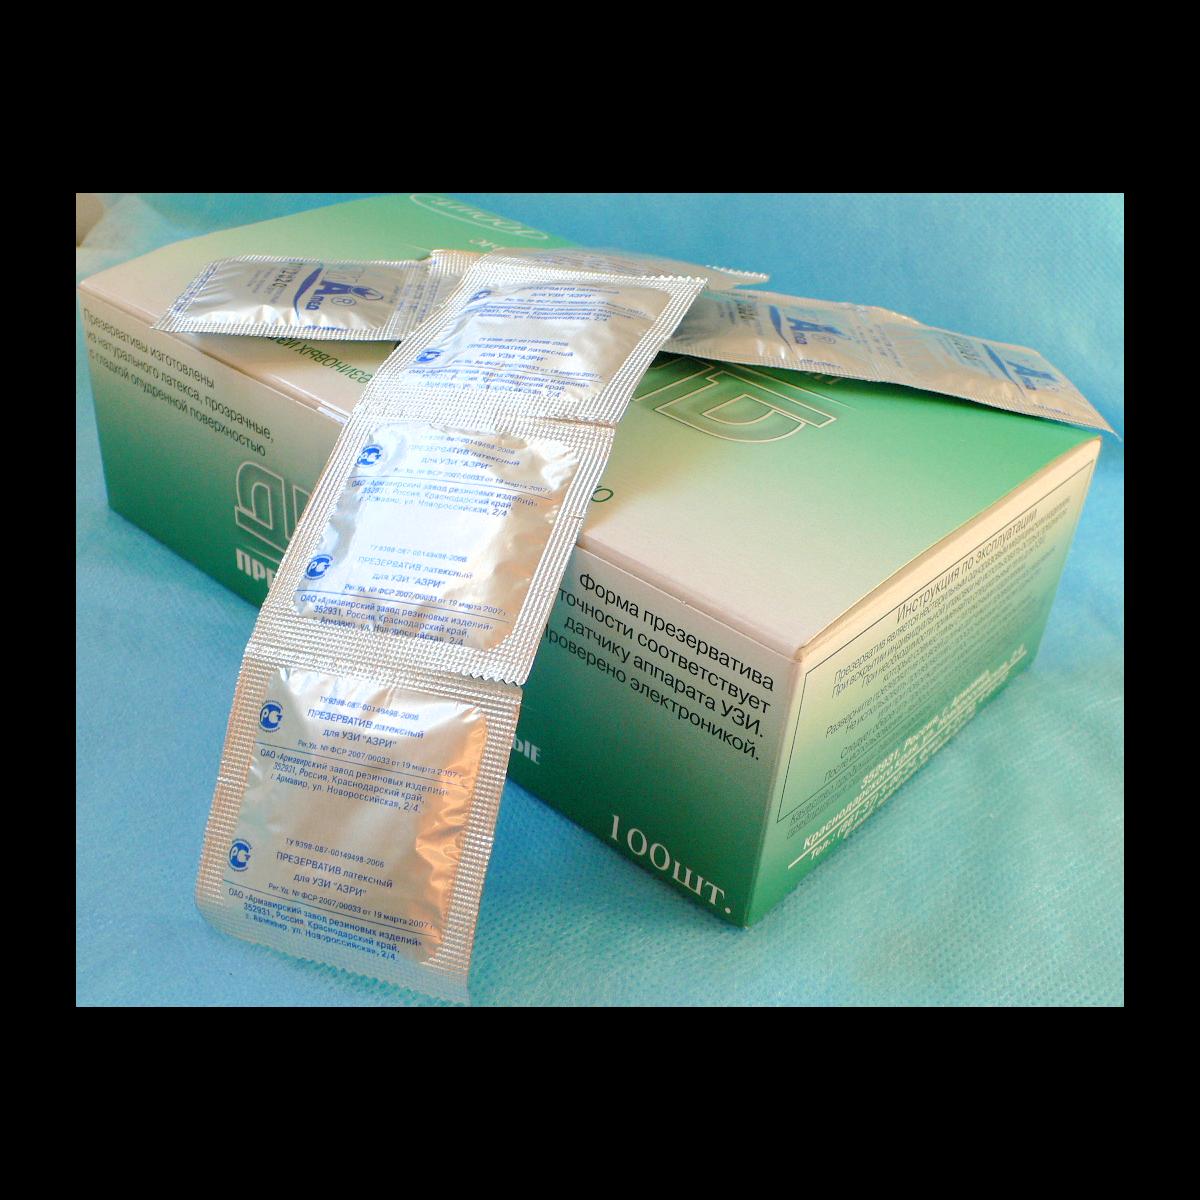 Презервативы для УЗИ АЗРИ, Россия (6,60 руб/шт)